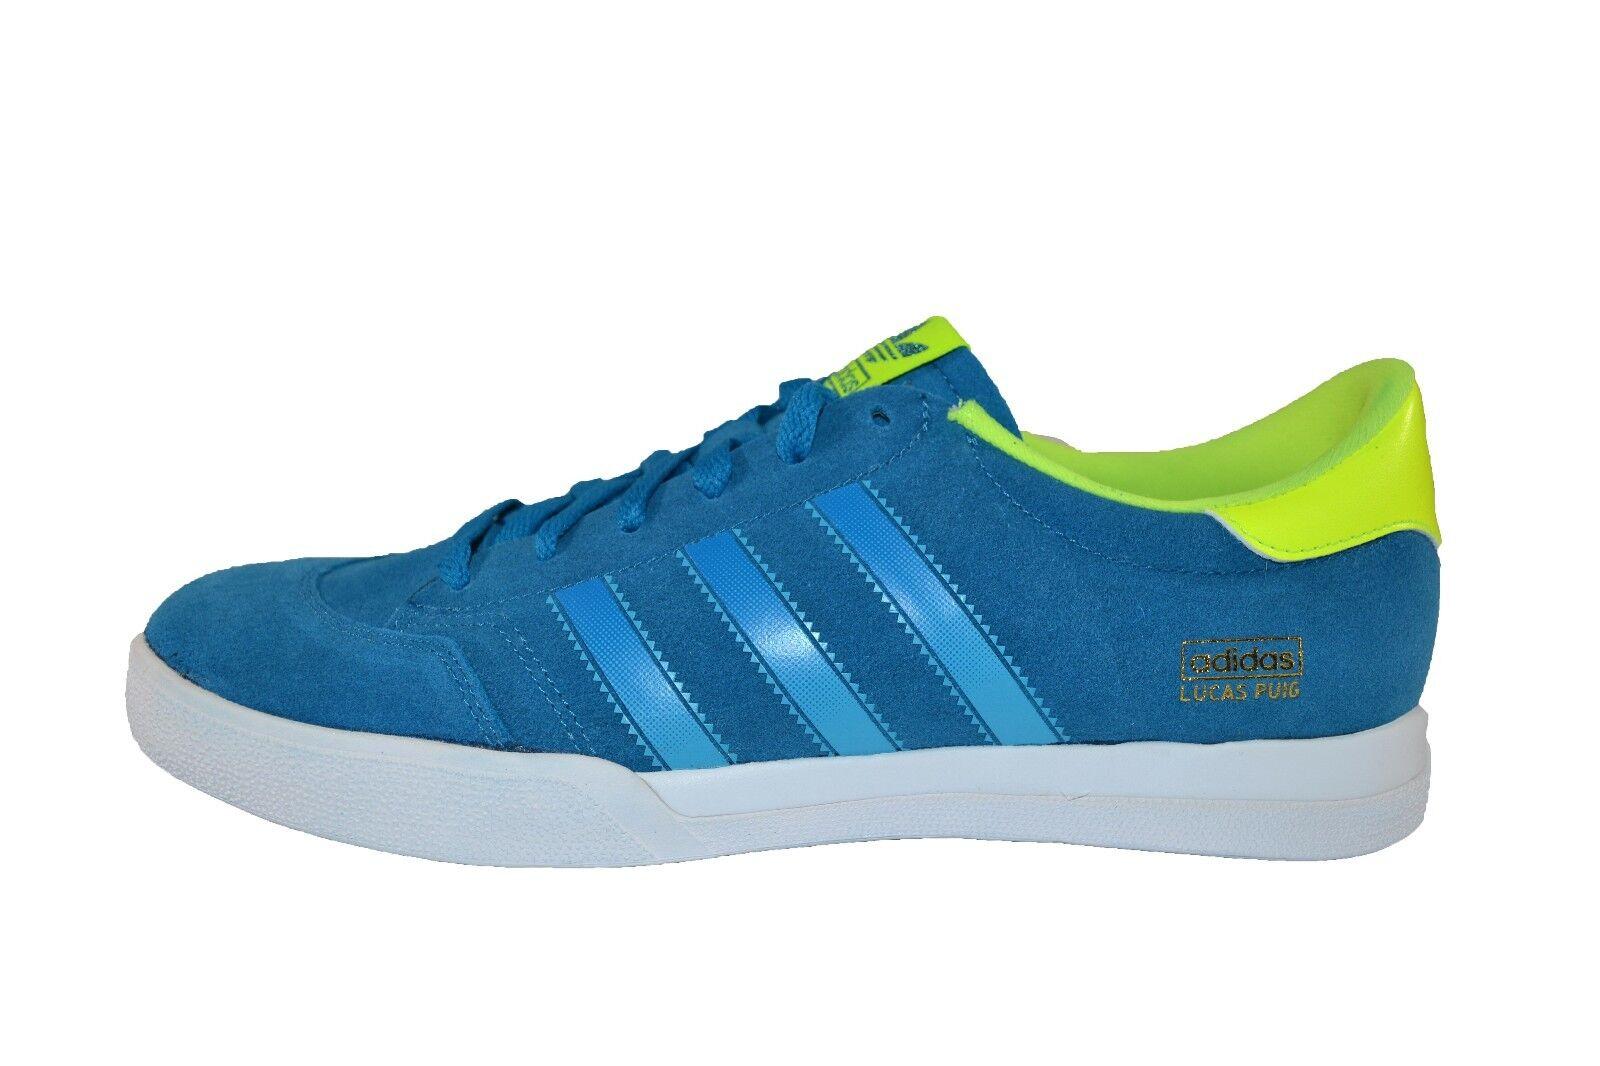 Adidas LUCAS Dark Solar bluee Samba bluee Electric Discounted (255) Men's shoes